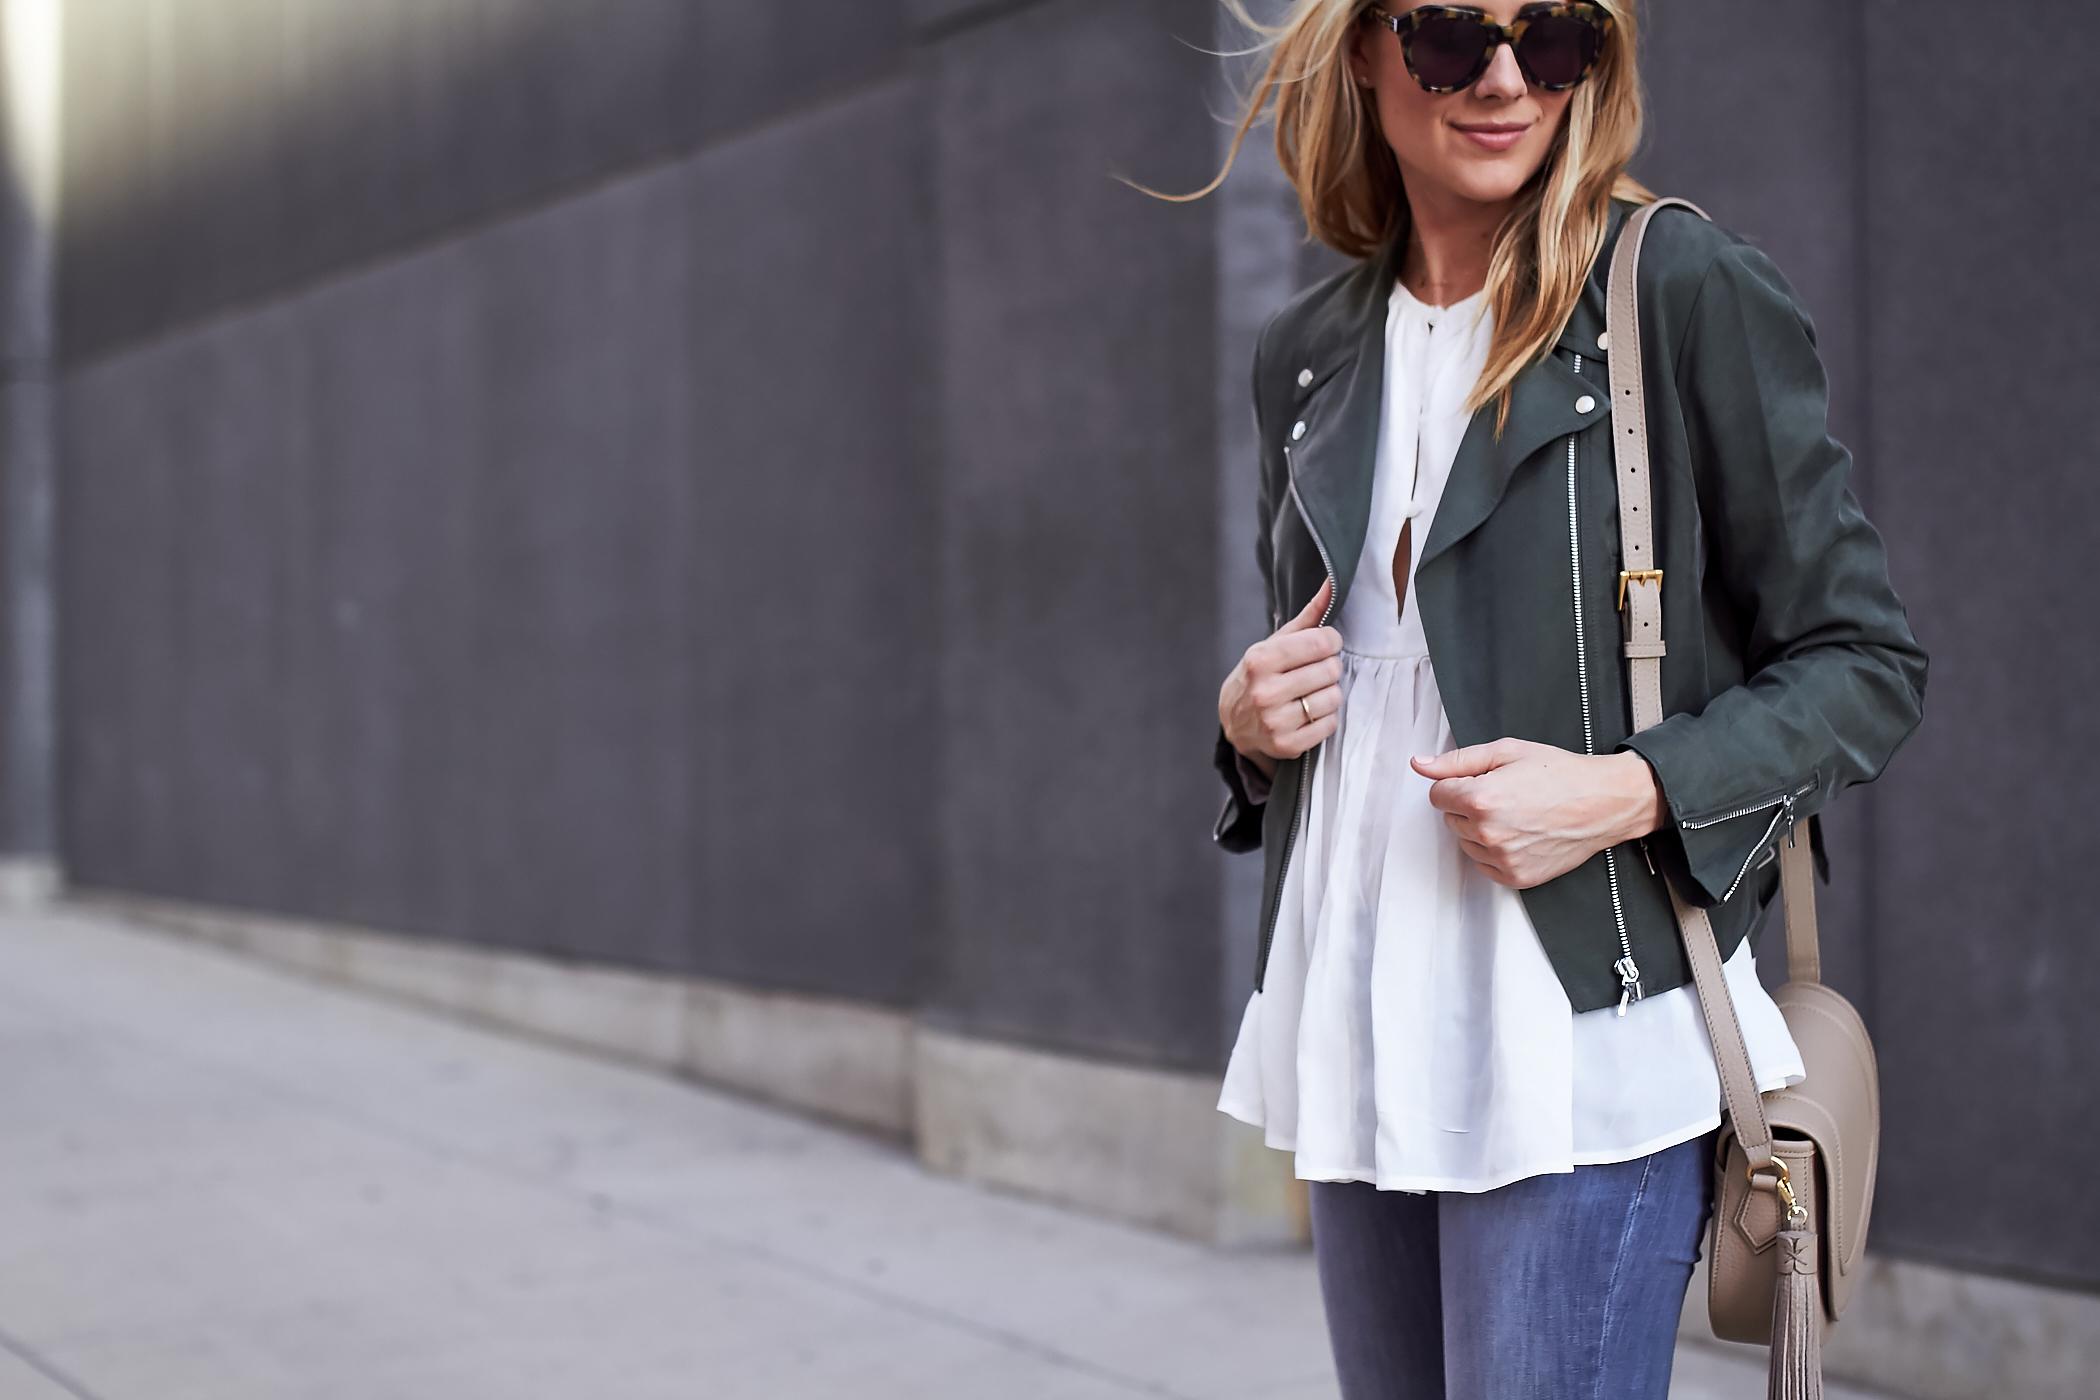 fashion-jackson-club-monaco-kapri-moto-jacket-sincereley-jules-cameron-blouse